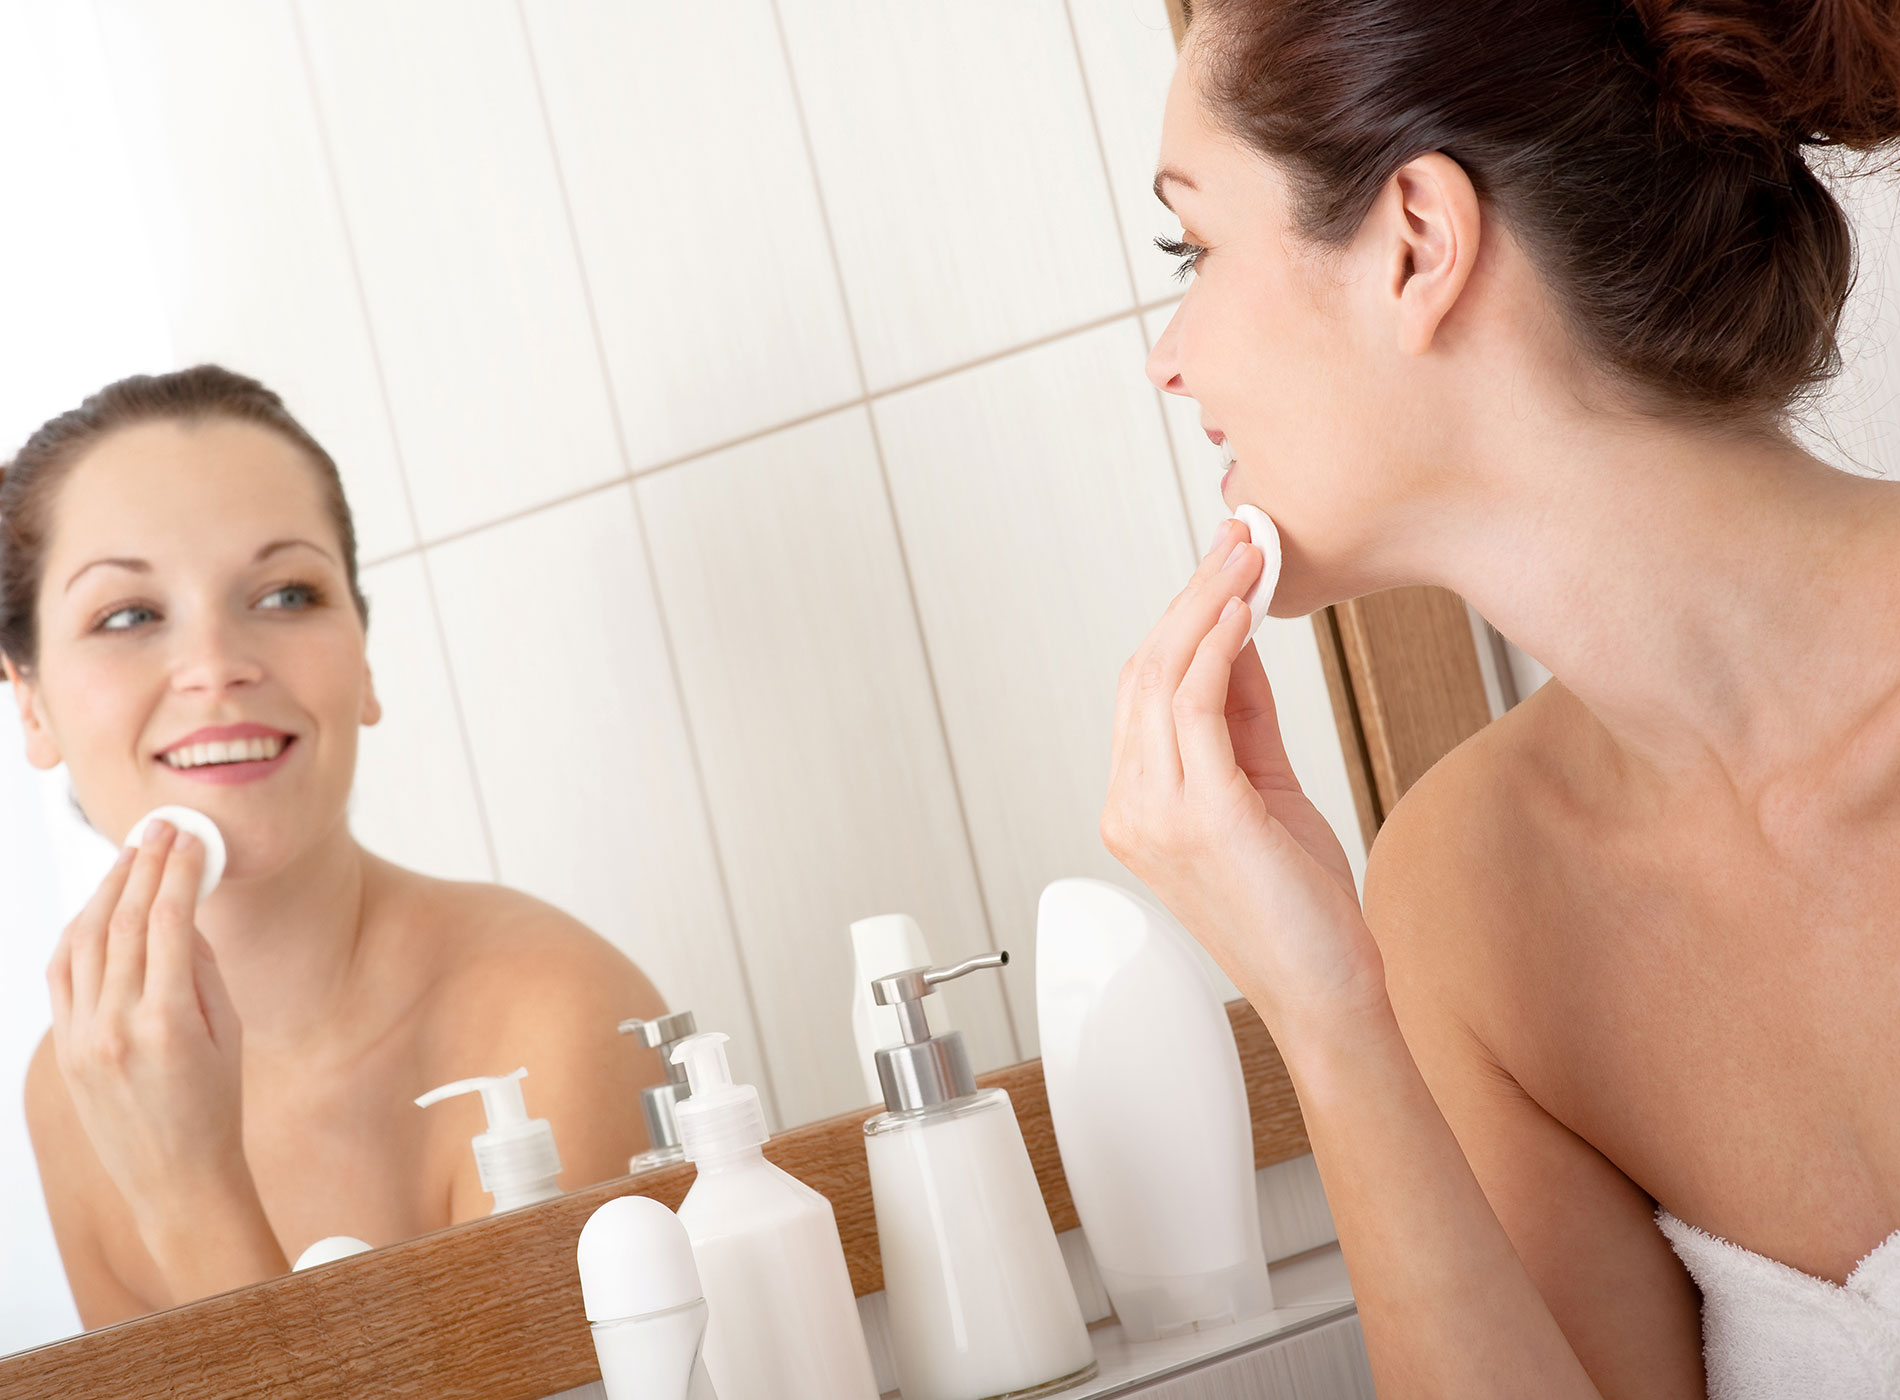 Уход за коже лица в домашних условиях 30 лет